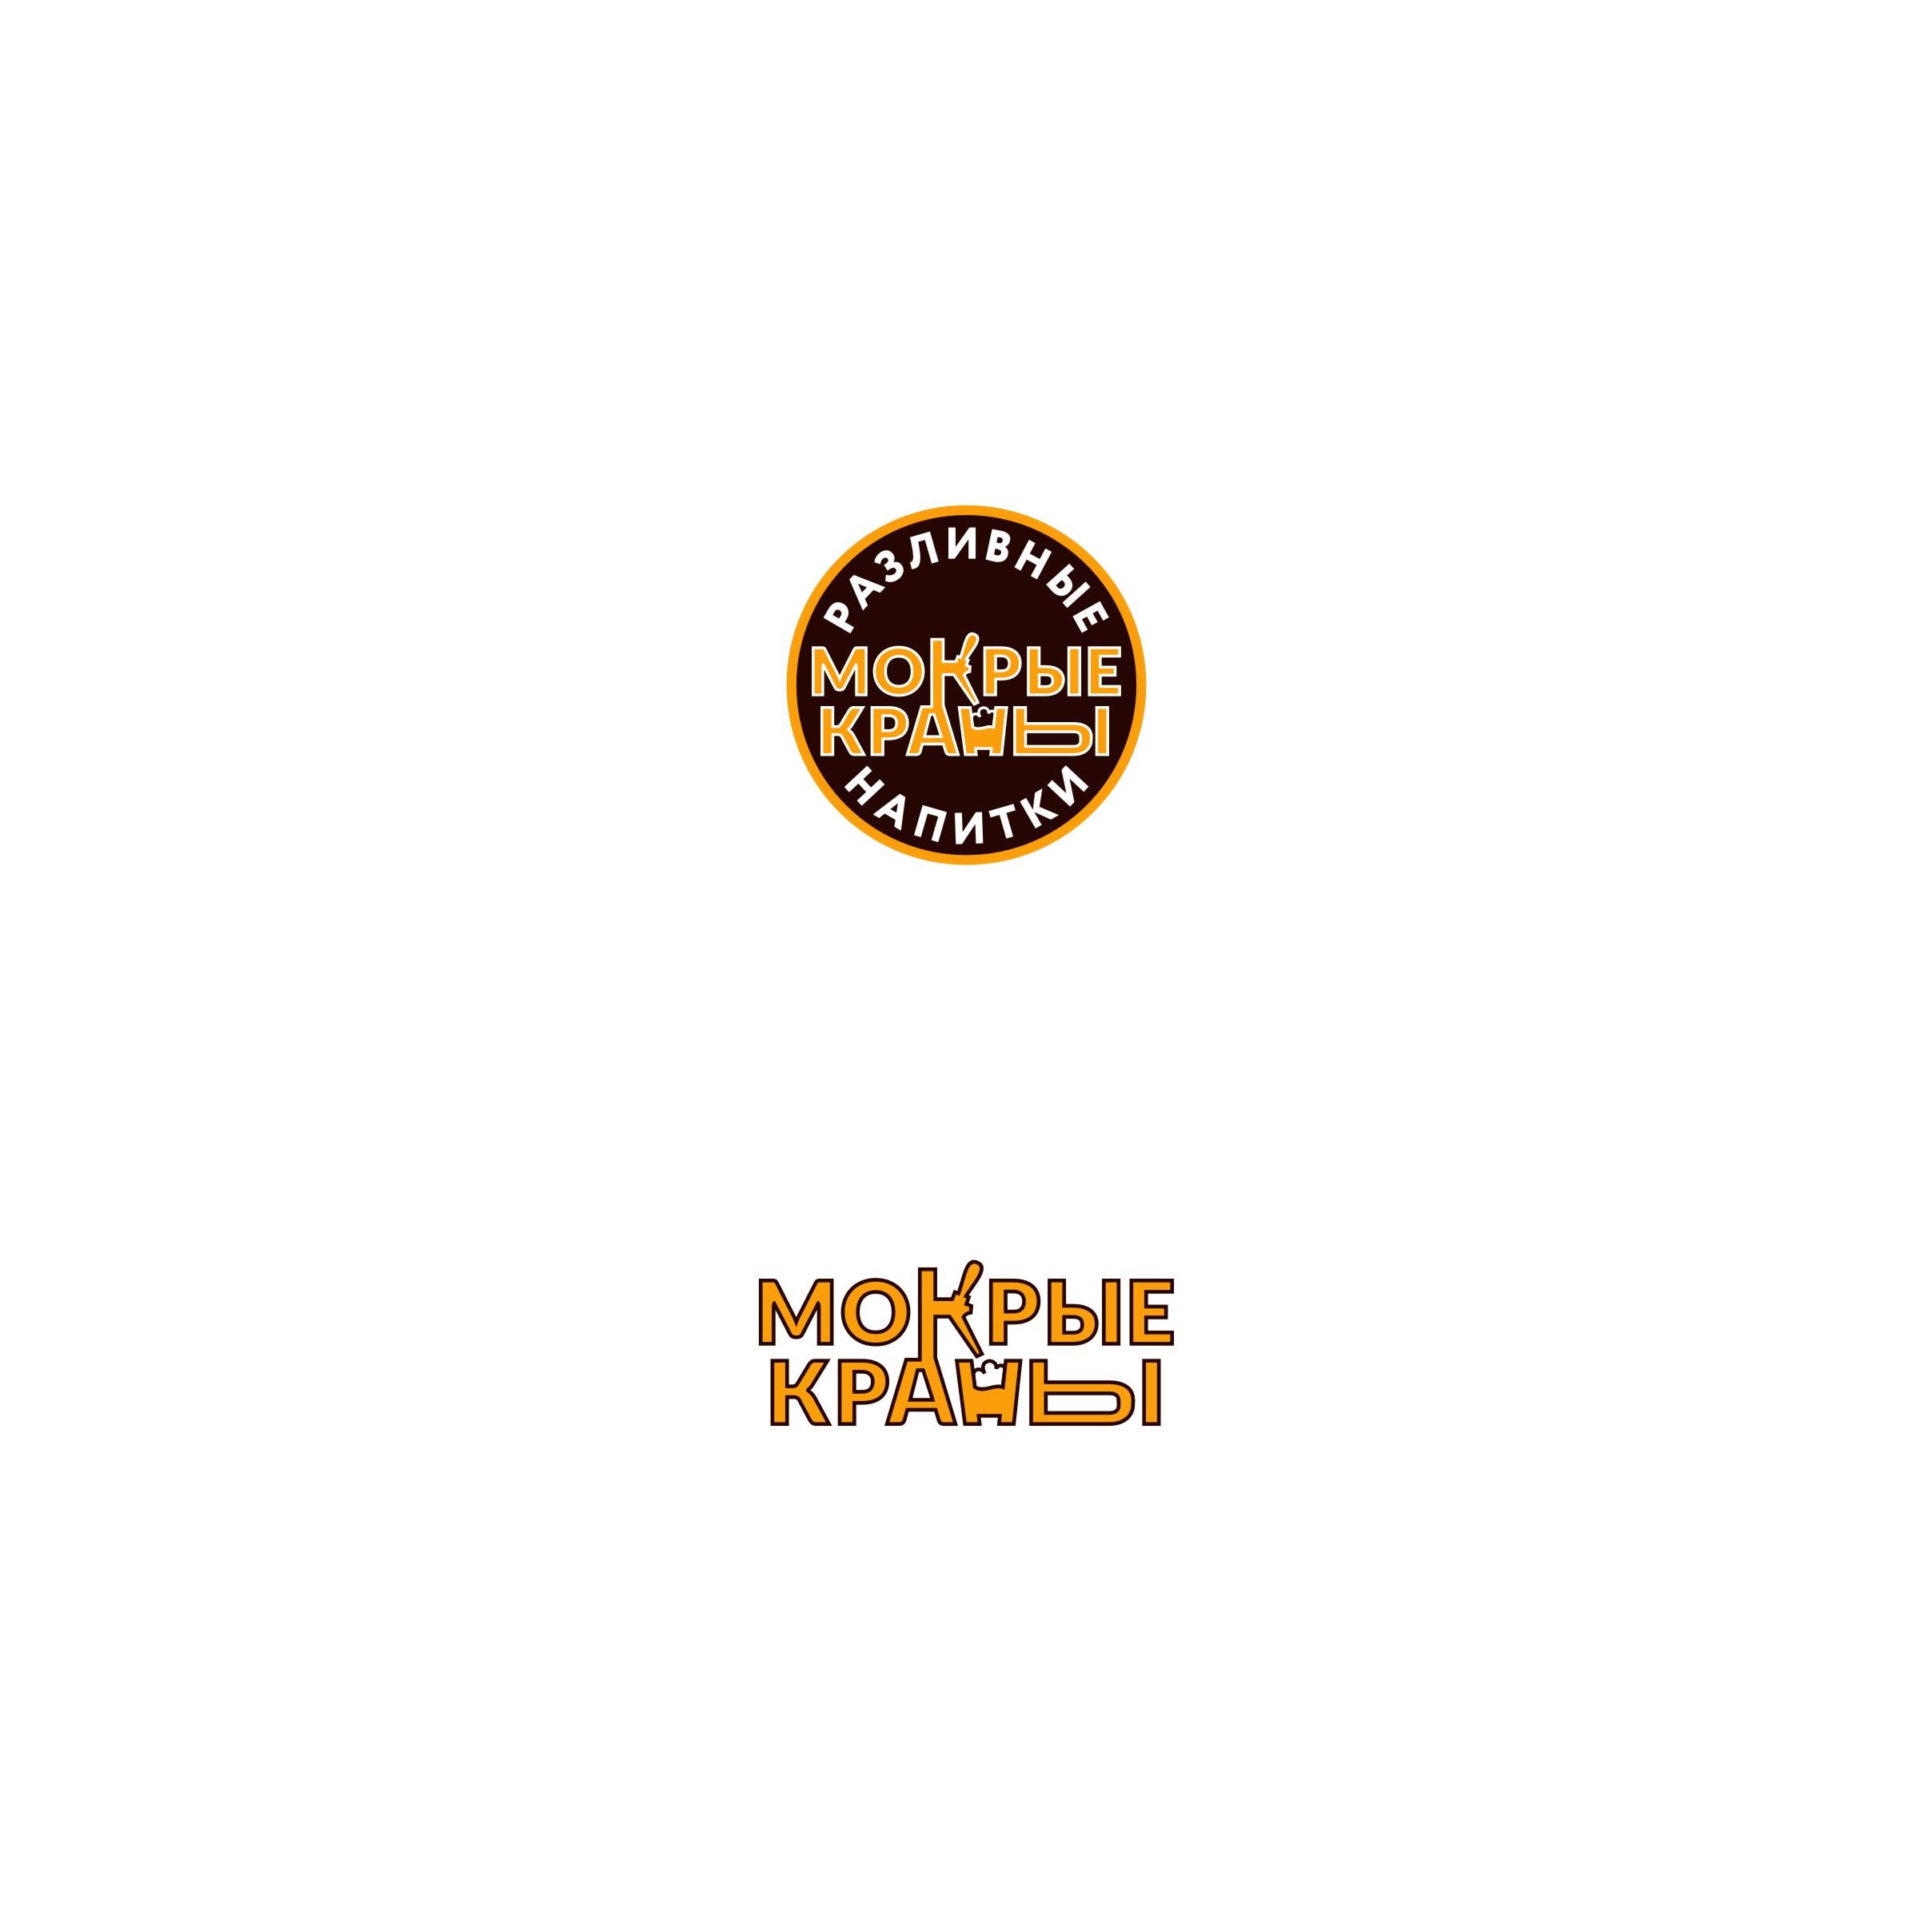 Вывеска/логотип для пивного магазина фото f_926602026aa1f816.jpg